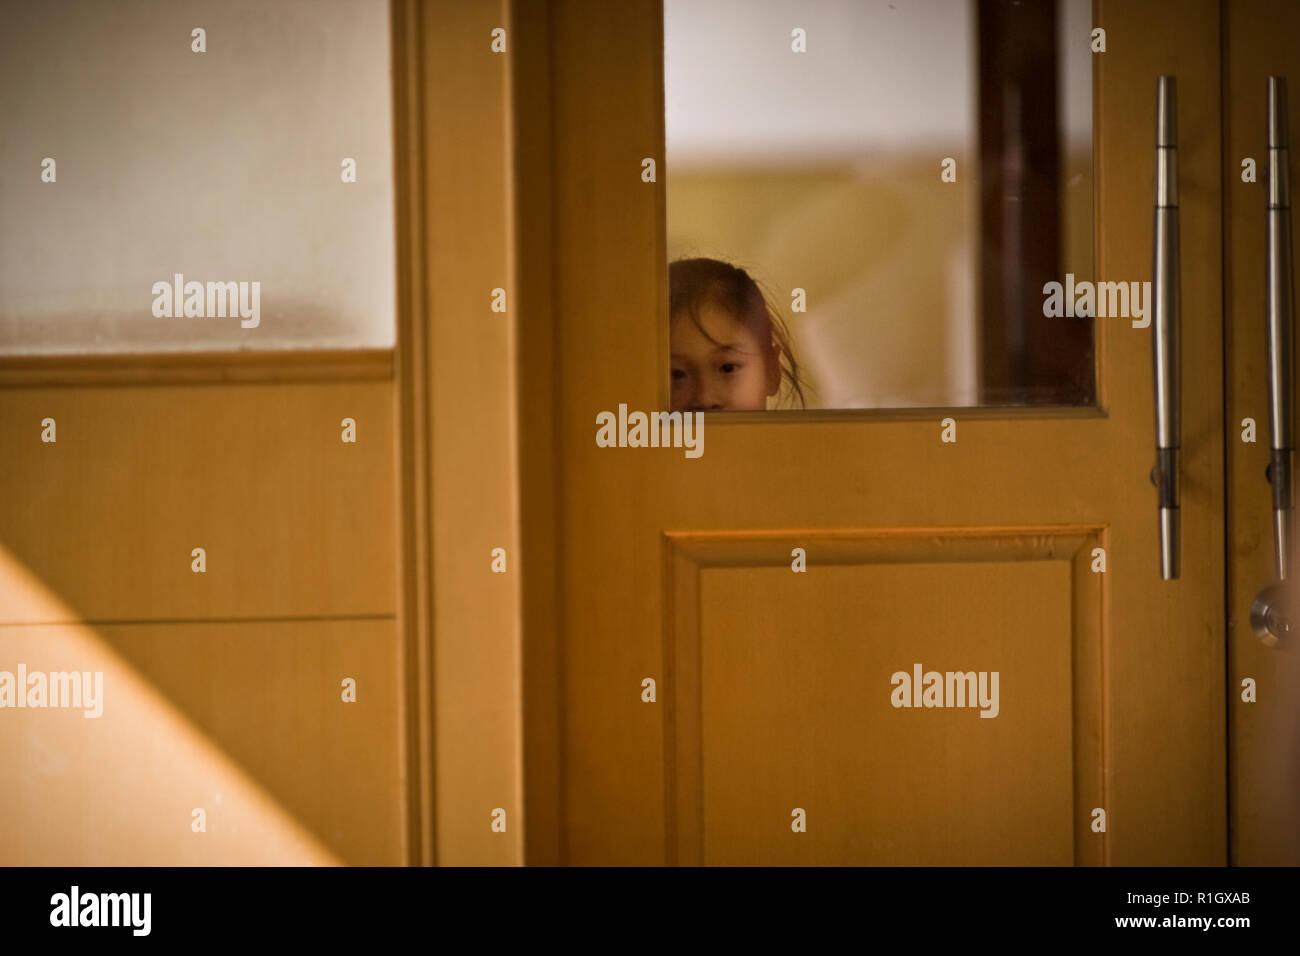 Girl peeking through the doors of a gym. - Stock Image